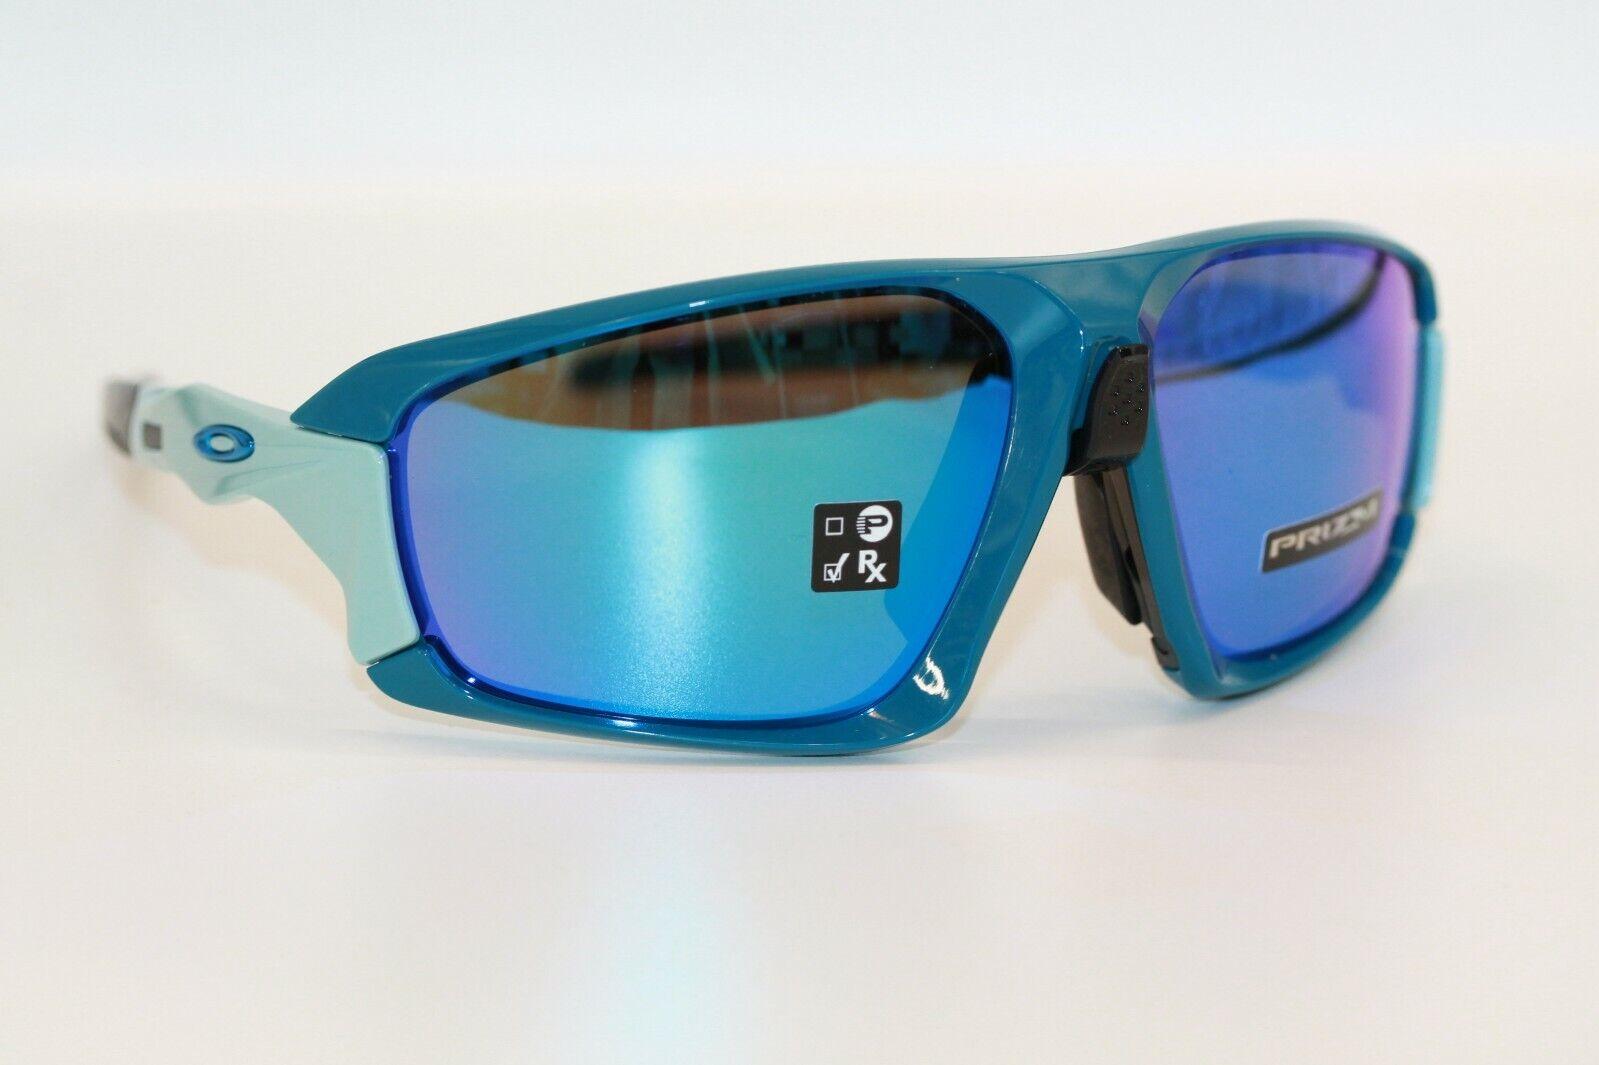 oakley-field-jacket-sunglasses-oo9402-0364-balsam-frame-w-prizm-sapphire-lens